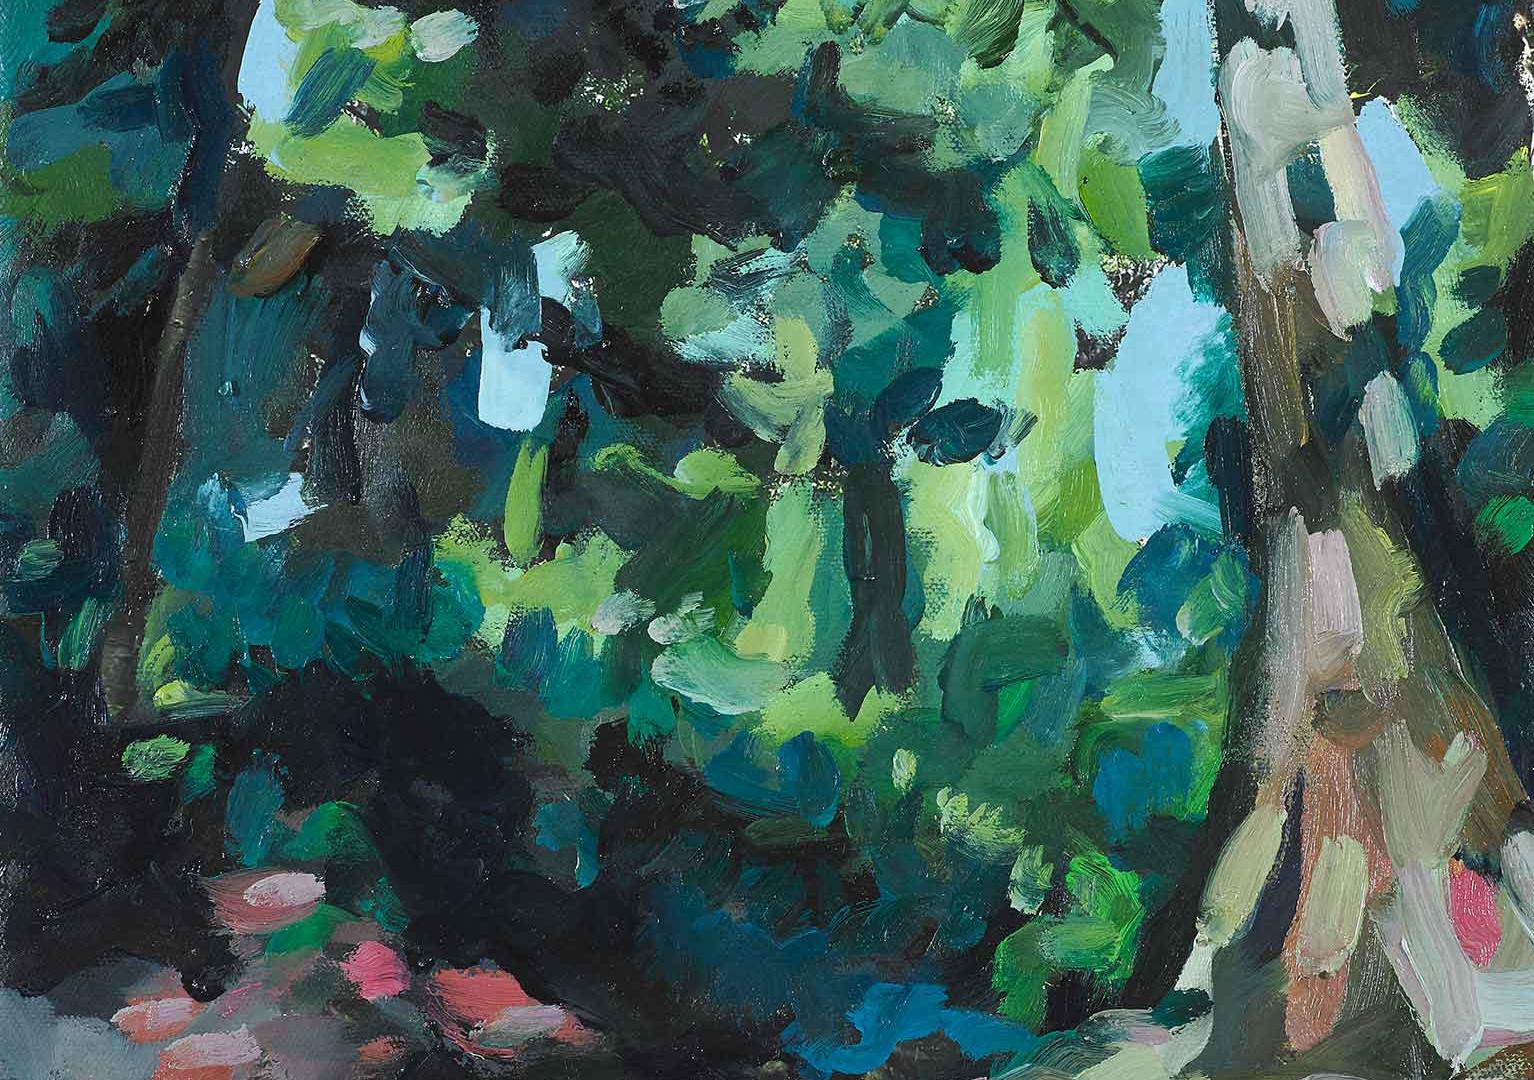 Felix Eckardt Green embrace 2019 Mischtechnik auf Leinwand 43,5 x 32 cm